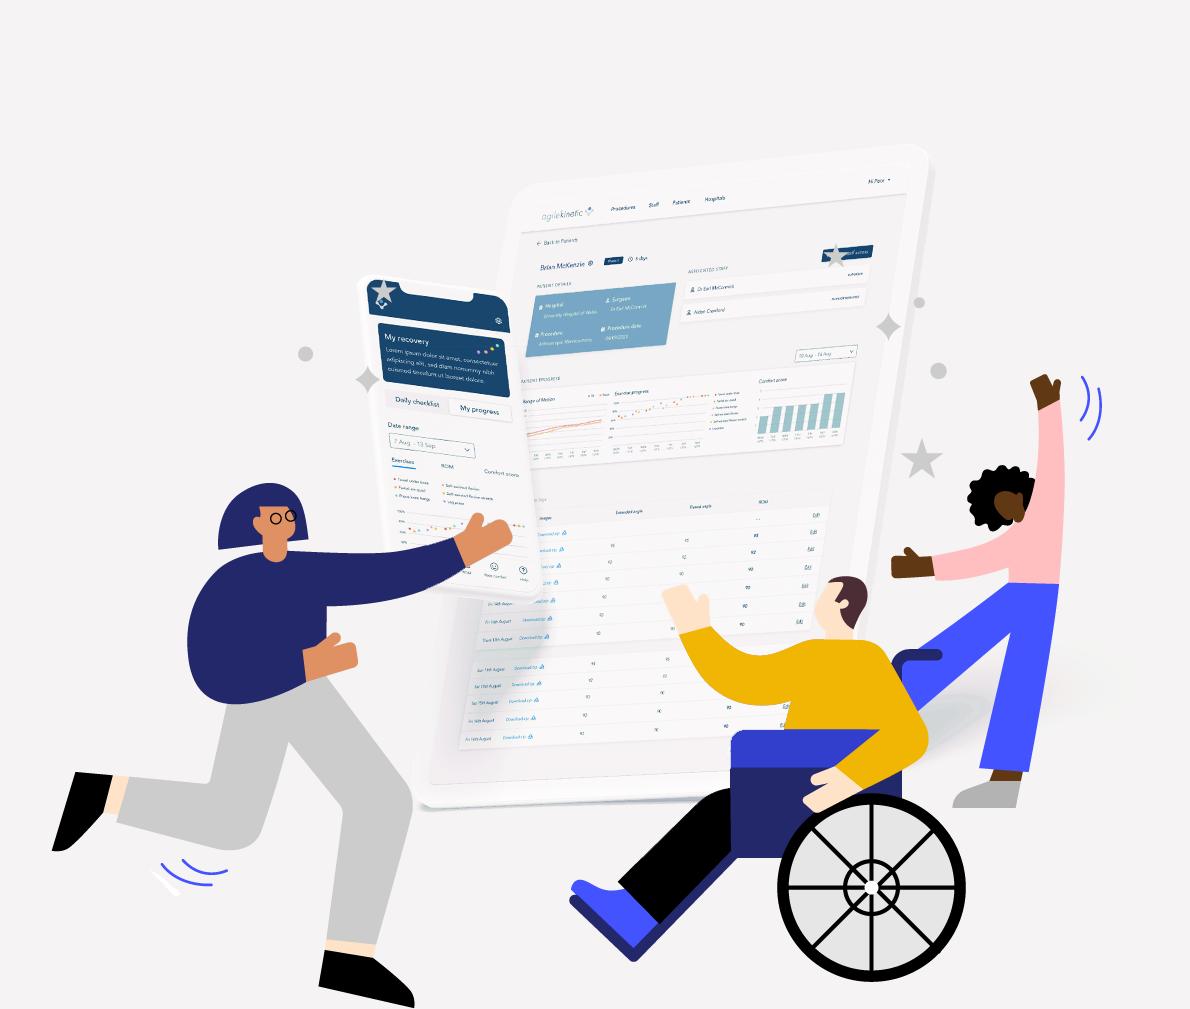 MobilityHub animated image